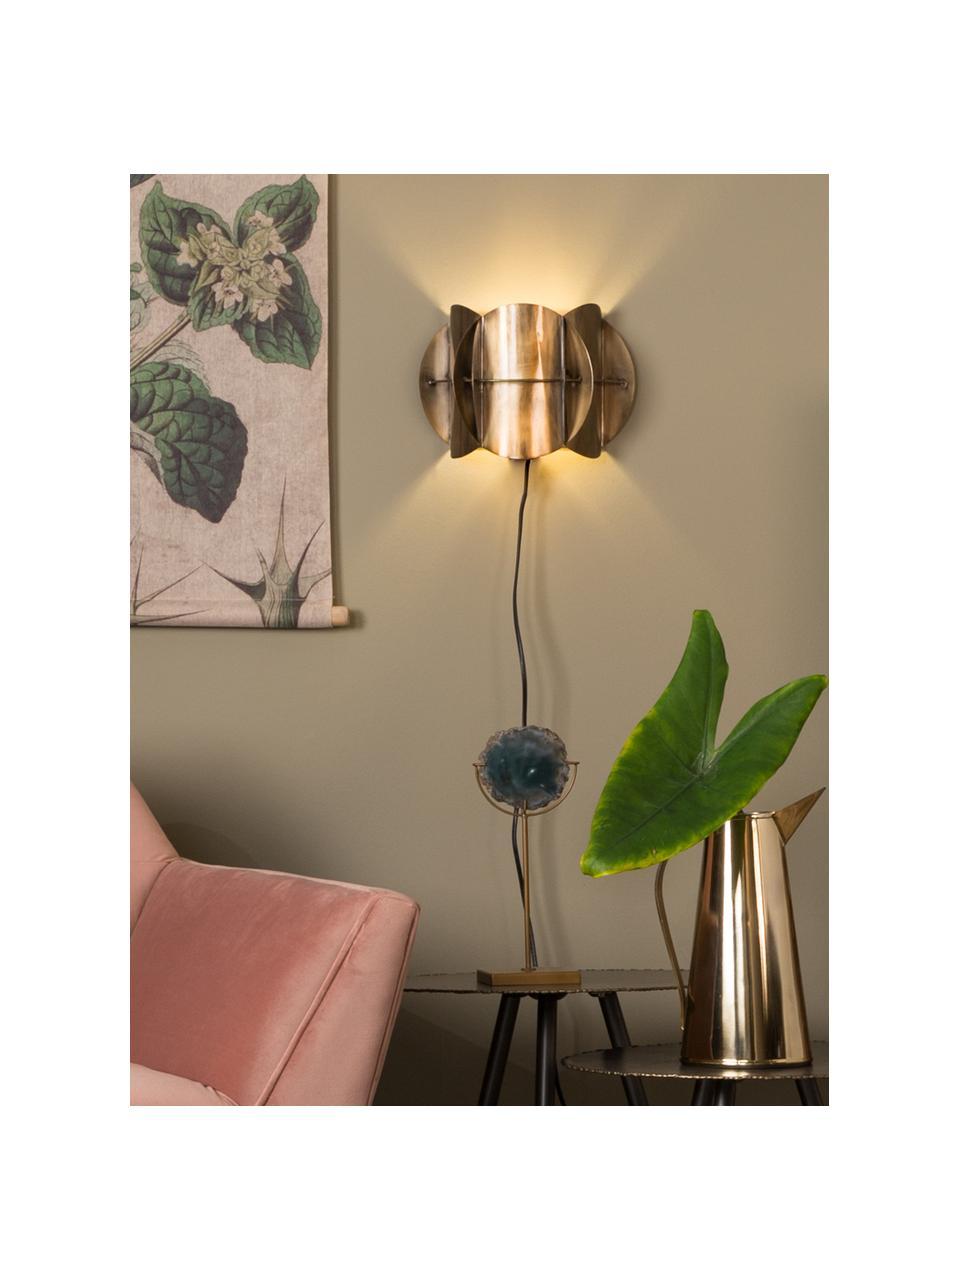 Applique di design con spina Corridor, Paralume: ottone, Ottone con finitura anticata, Larg. 27 x Alt. 19 cm